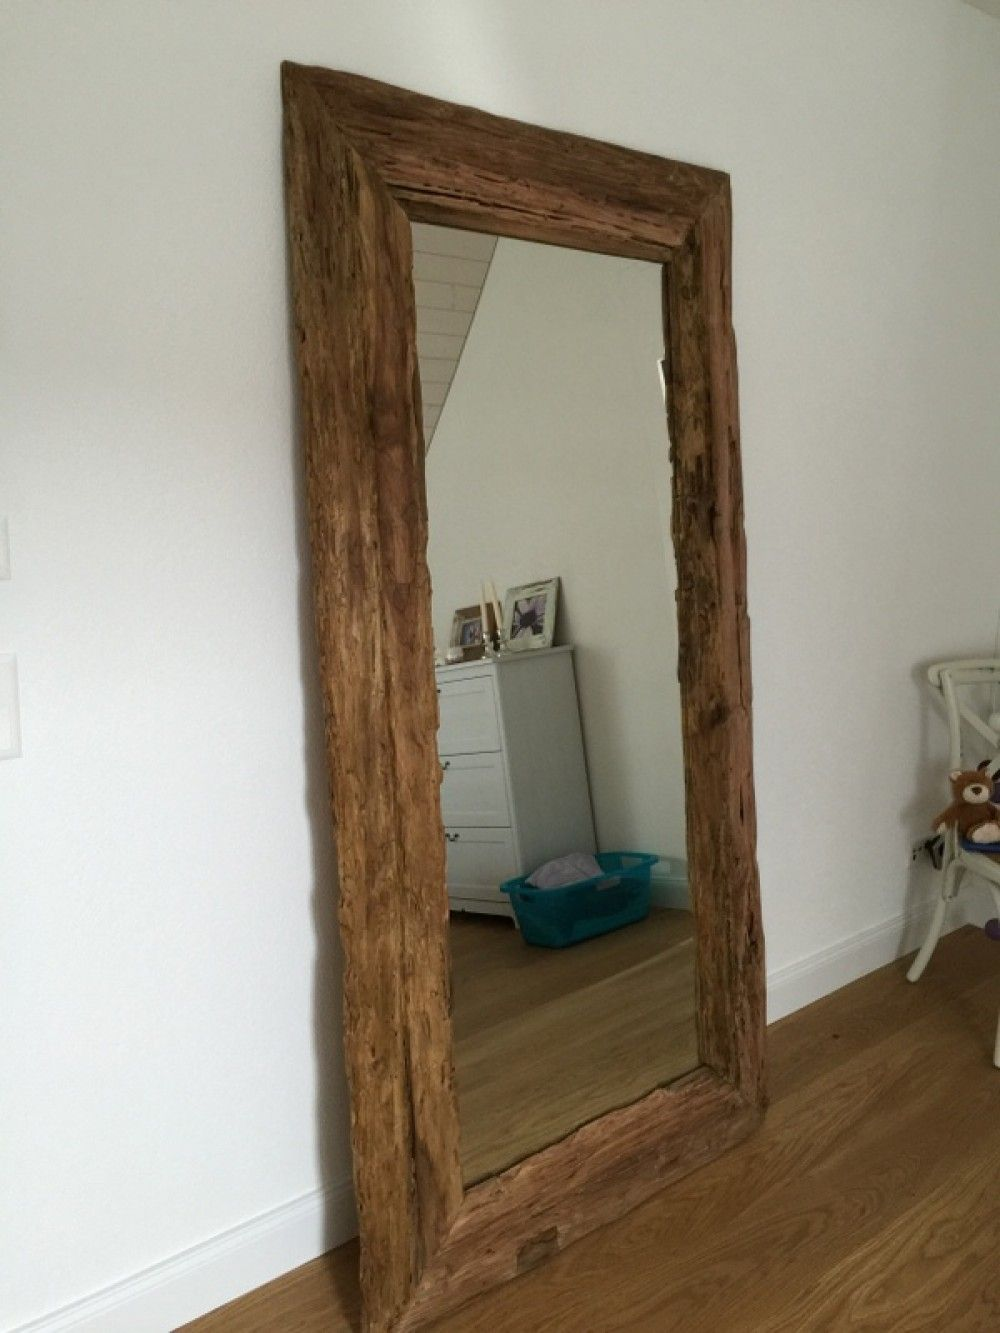 spiegel massivholz teak wandspiegel altholz ma e 200 x 80 cm wohnaccessoires home decor. Black Bedroom Furniture Sets. Home Design Ideas